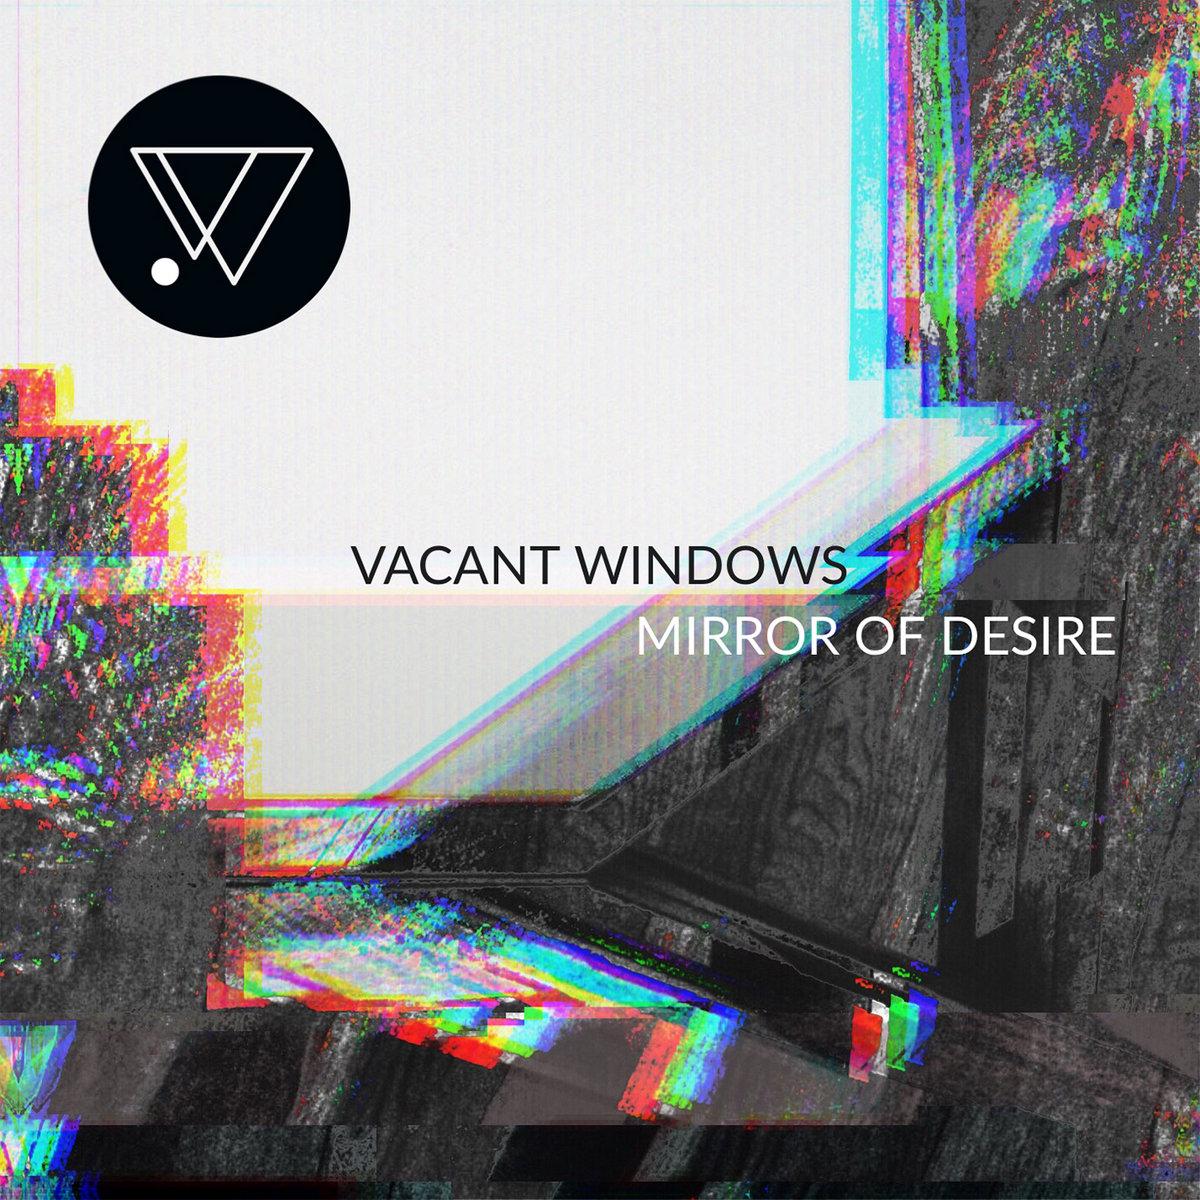 Mirror of Desire by Vacant Windows